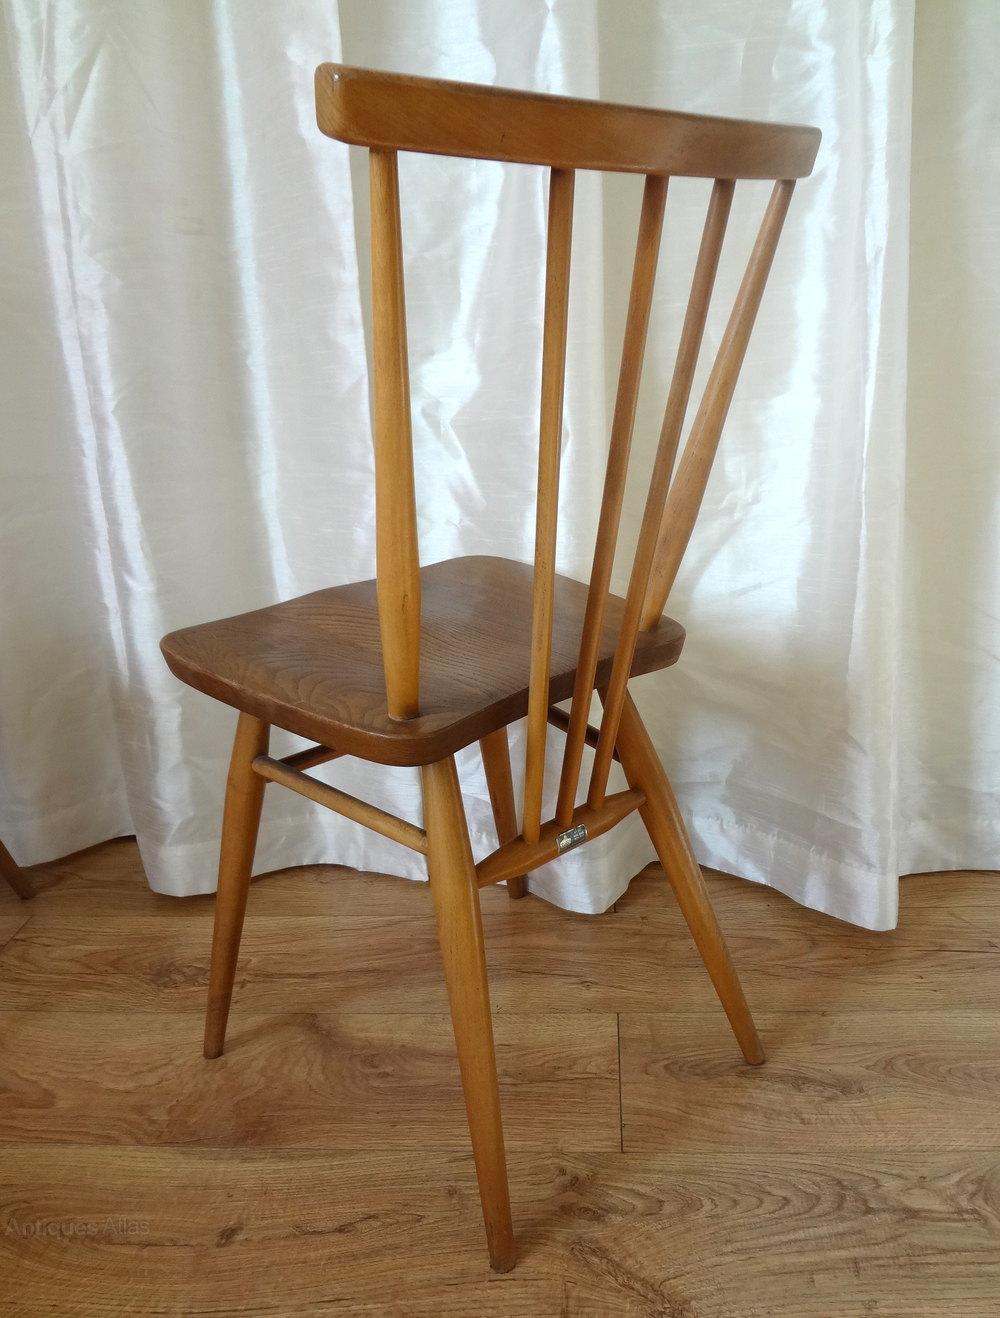 dating ercol furniture Genuine vintage & retro ercol furniture from trusted dealers - loveantiquescom.